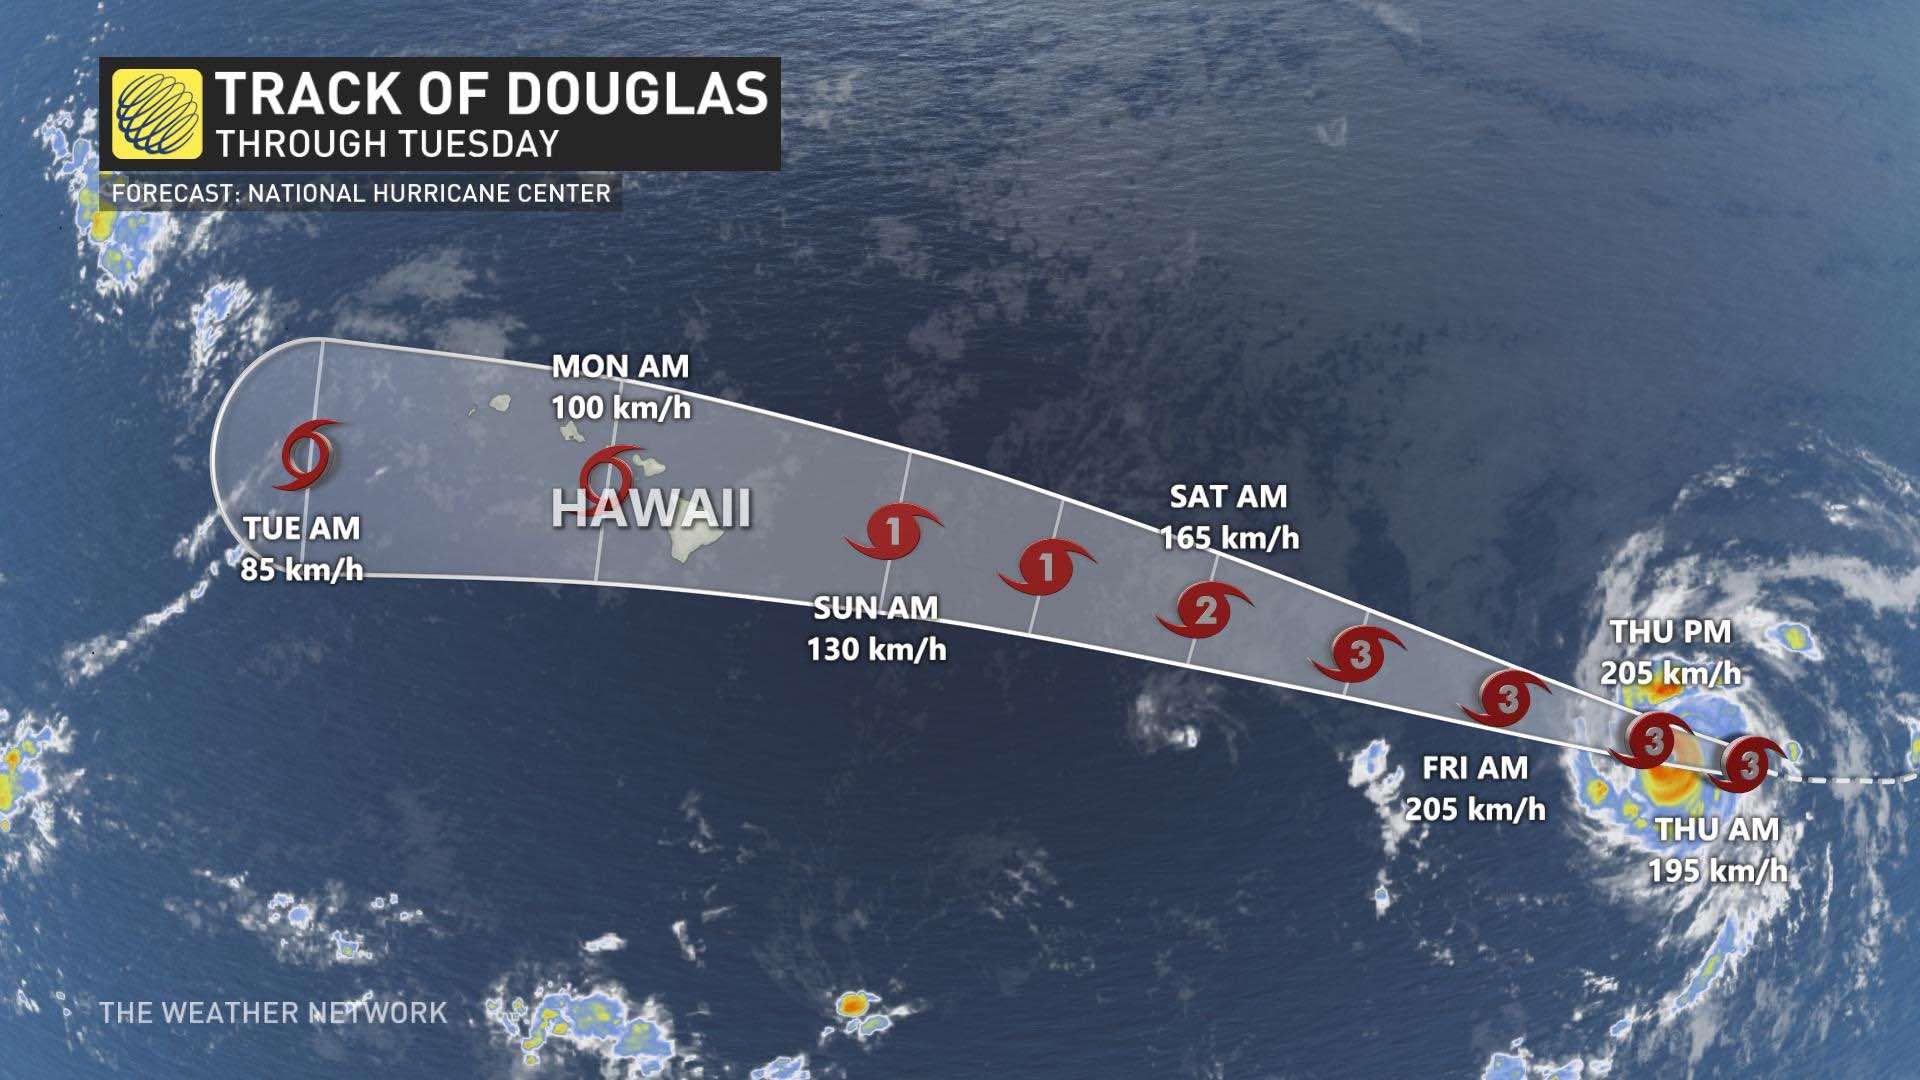 Hawaii bracing for rain, wind, surf impacts from major Hurricane Douglas